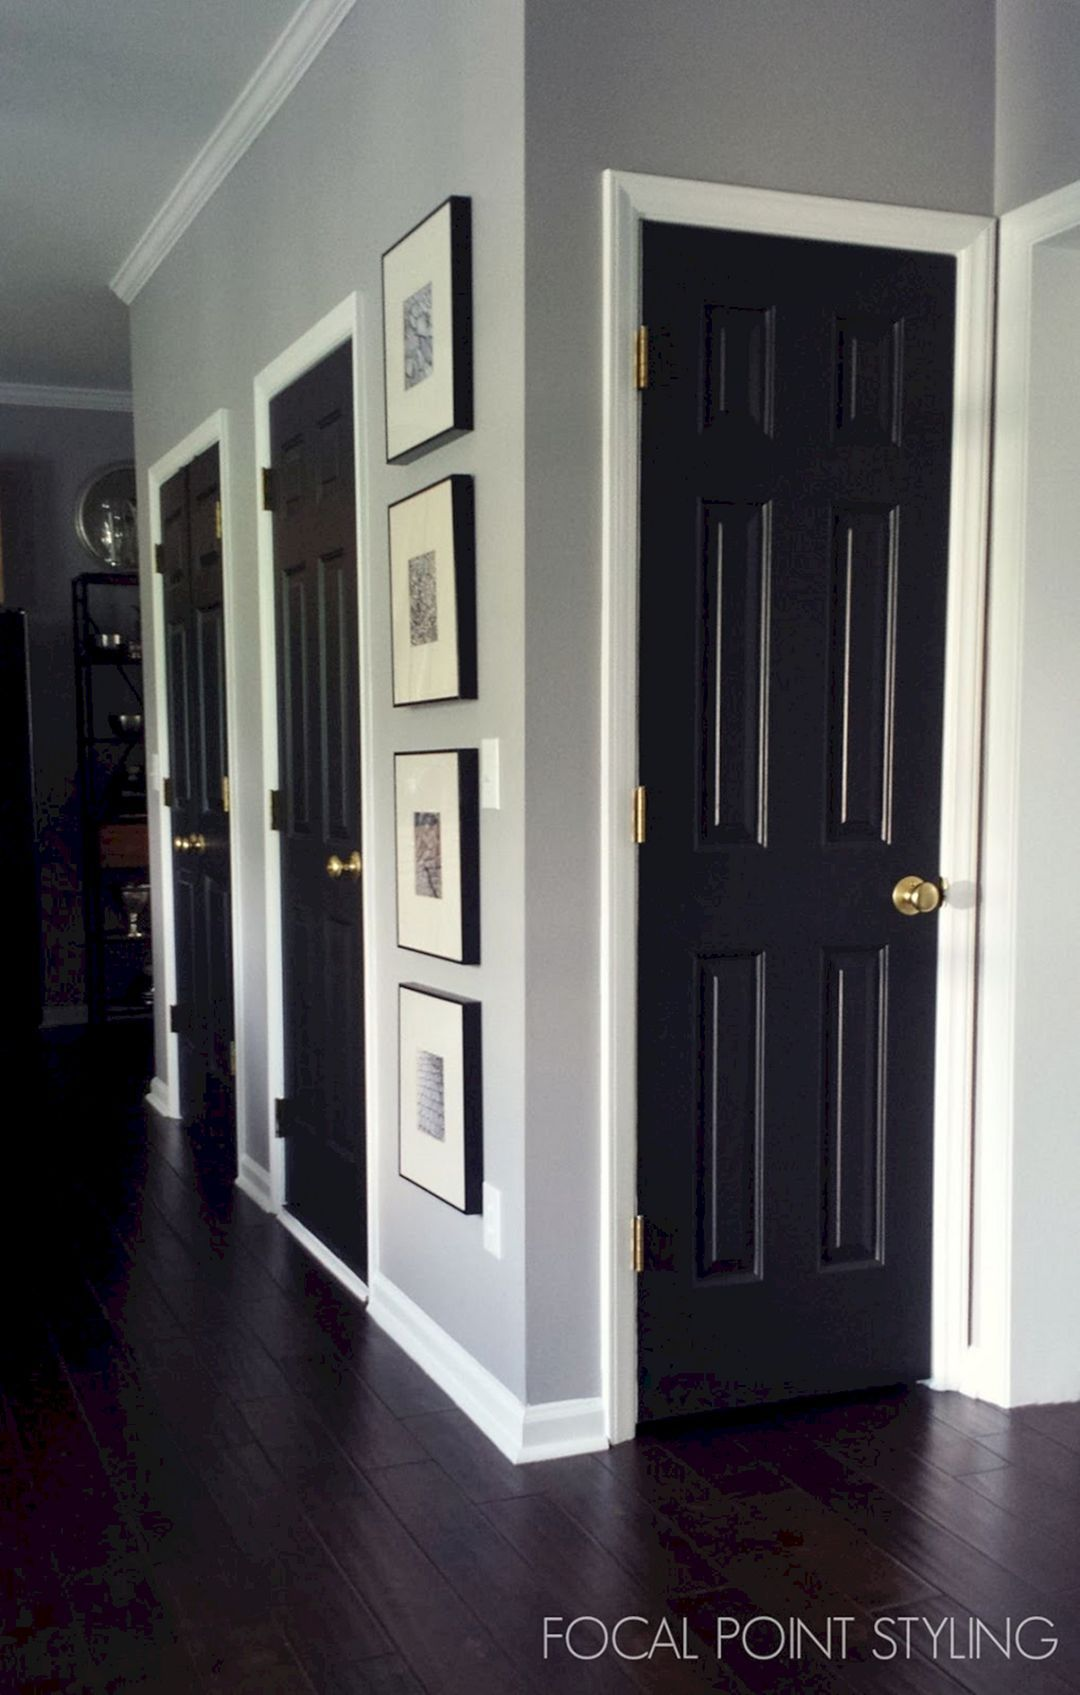 60 Most Popular Focal Points Ideas To Build A Beautiful Interior Freshouz Com Black Interior Doors Painting Interior Doors Black Painted Interior Doors